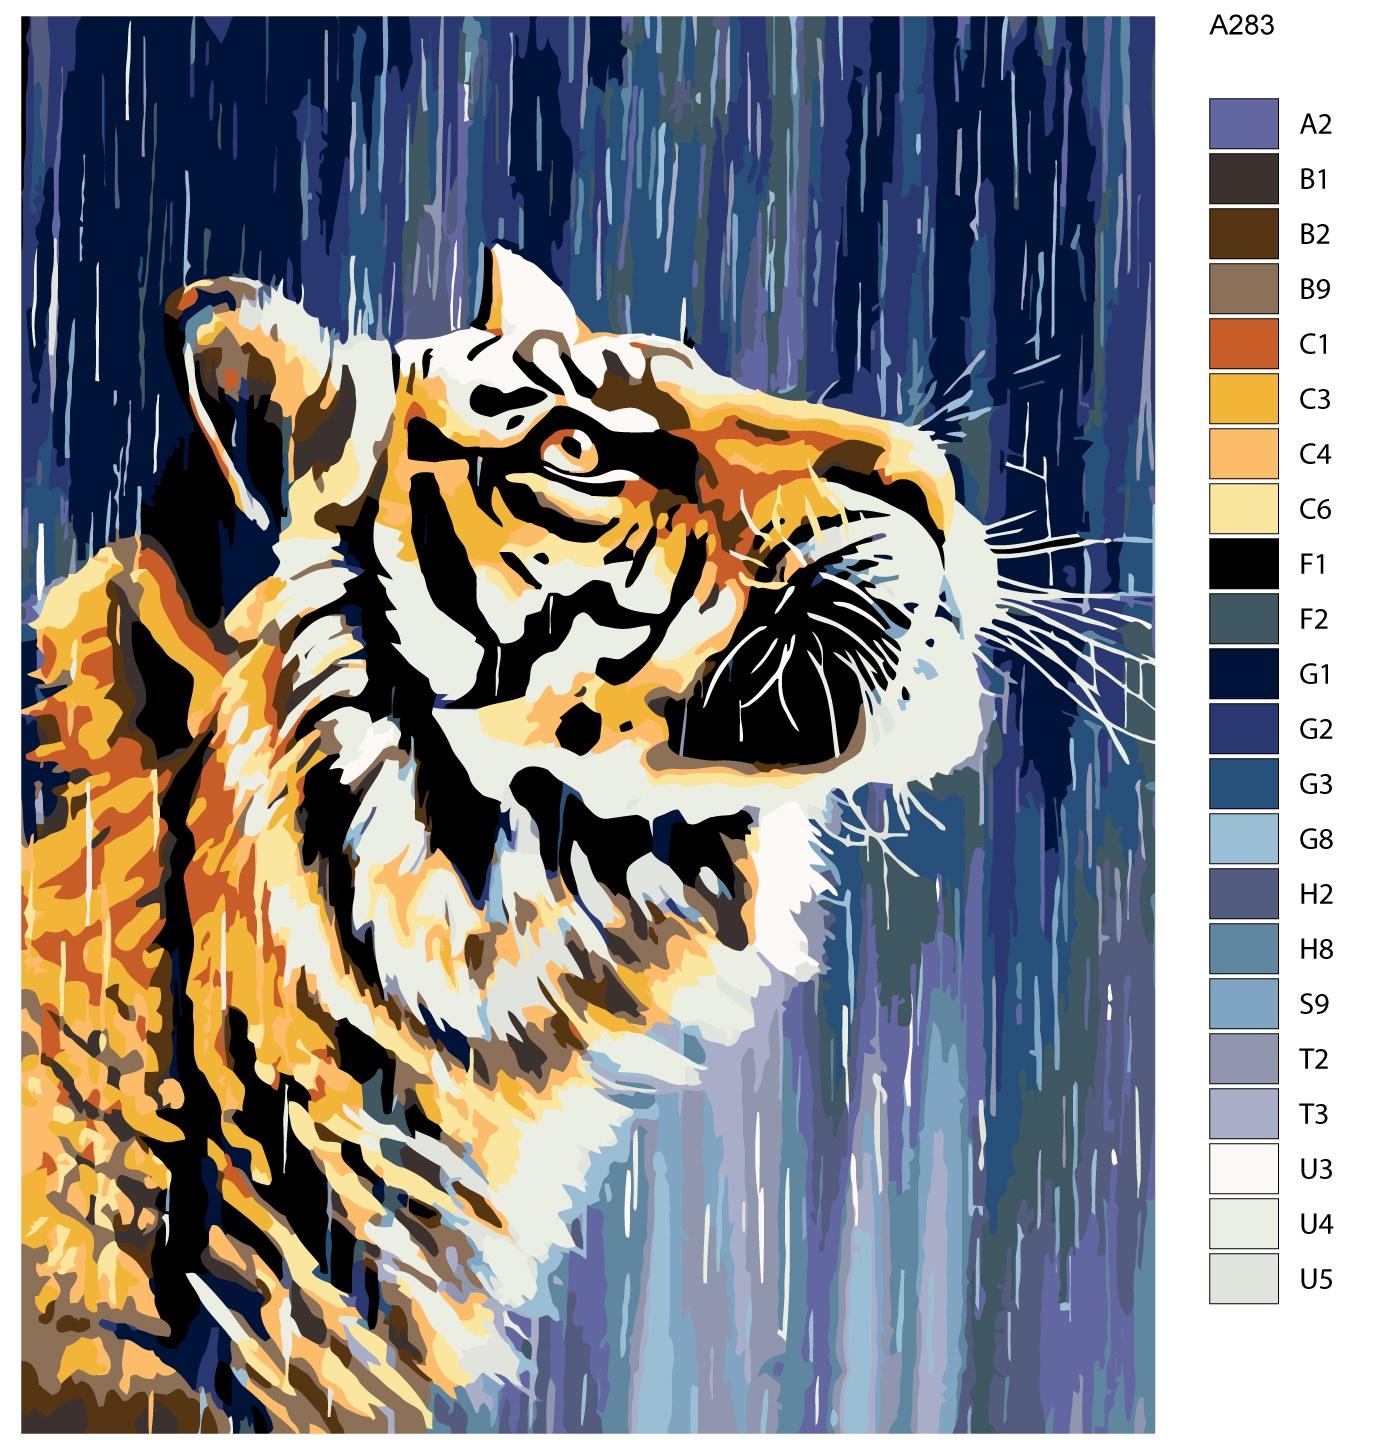 Картина по номерам, 80 x 100 см, A283